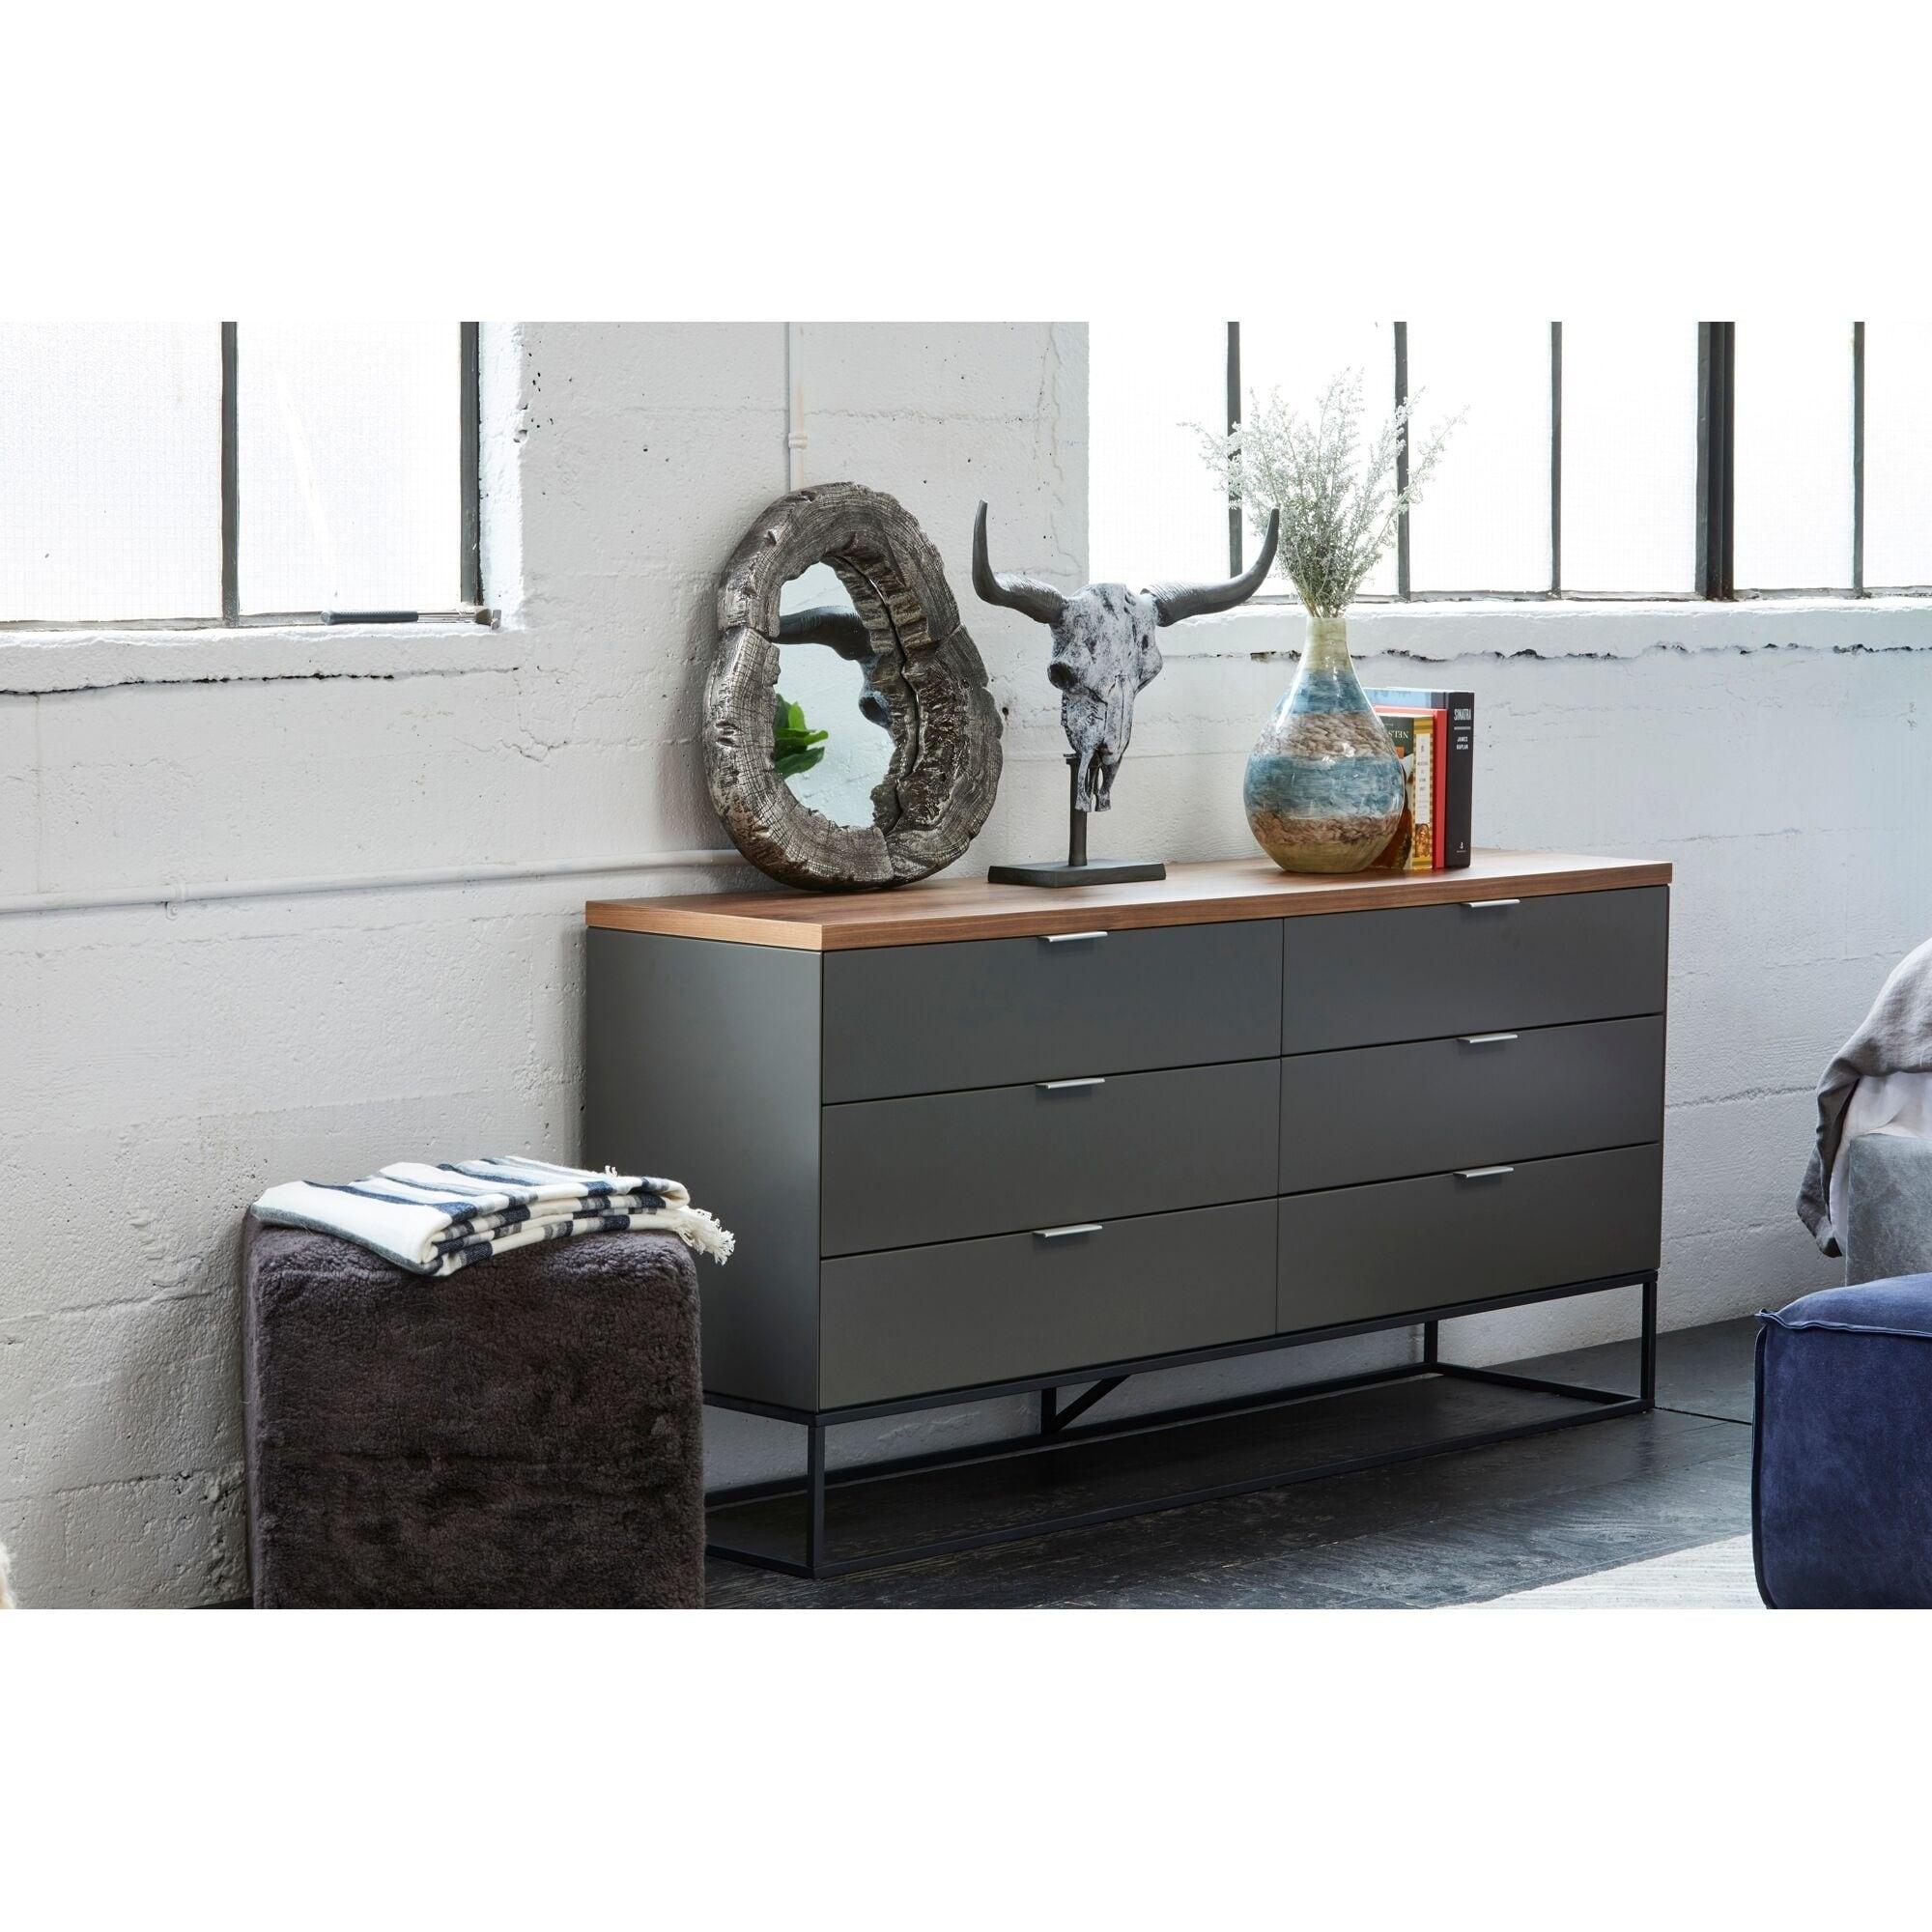 Shop Aurelle Home Rustic Wood Framed Mirror Clear On Sale Overstock 26042955